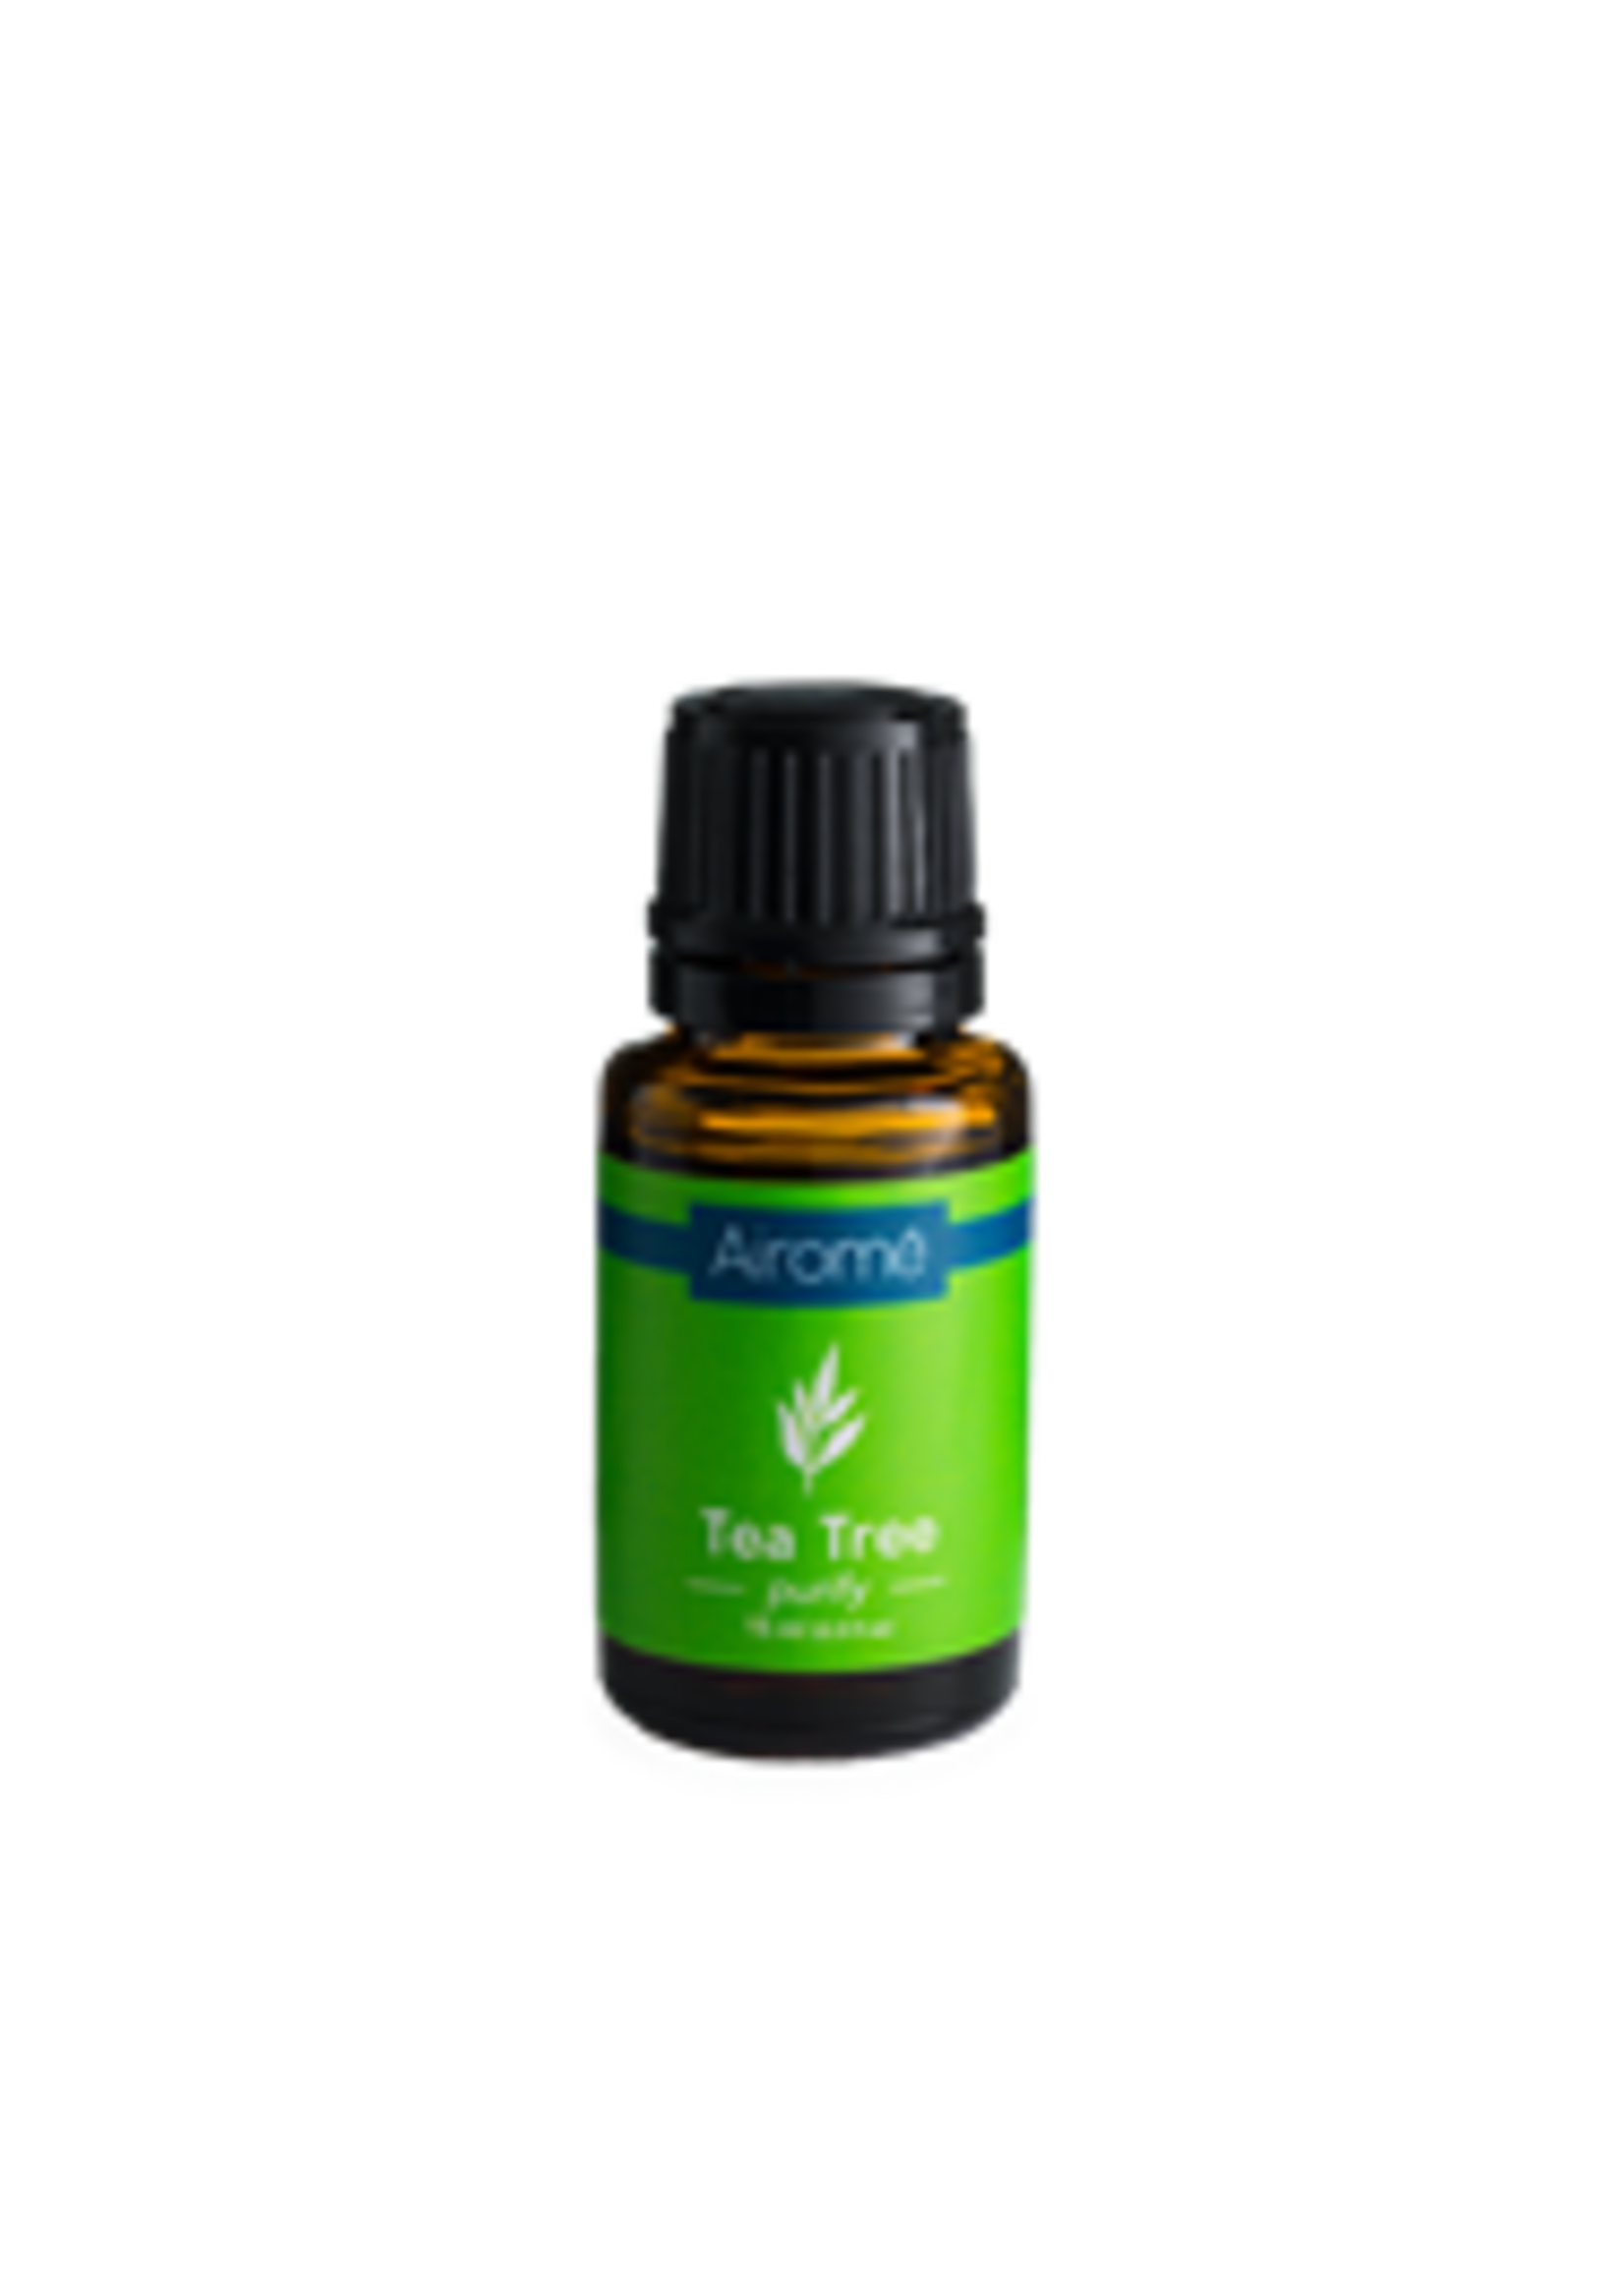 Airome Tea Tree Essential Oil 15ml